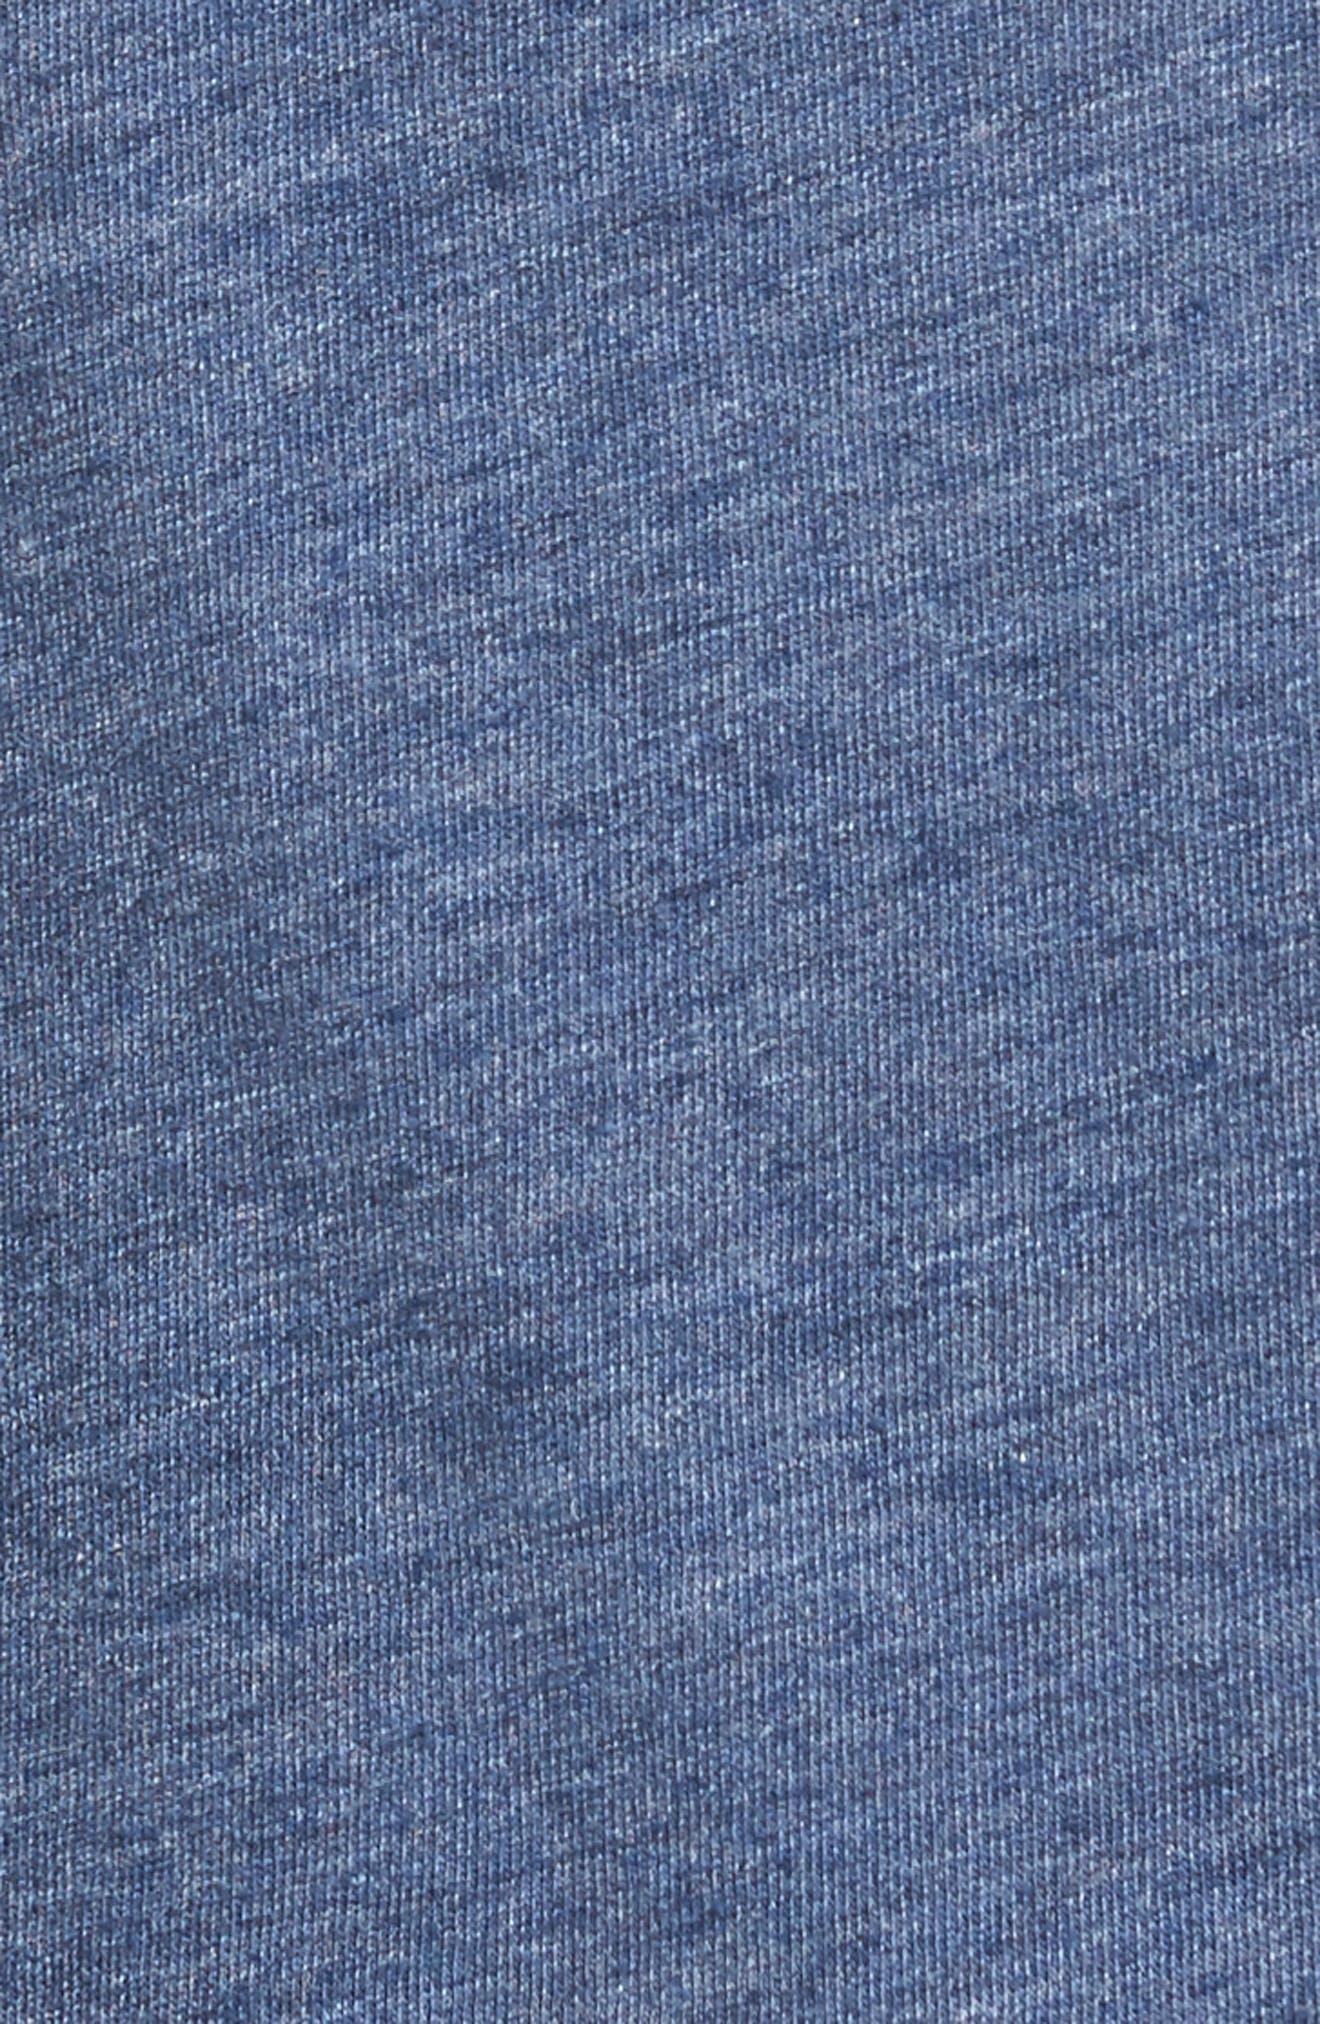 STP Racer's Edge Graphic T-Shirt,                             Alternate thumbnail 5, color,                             410